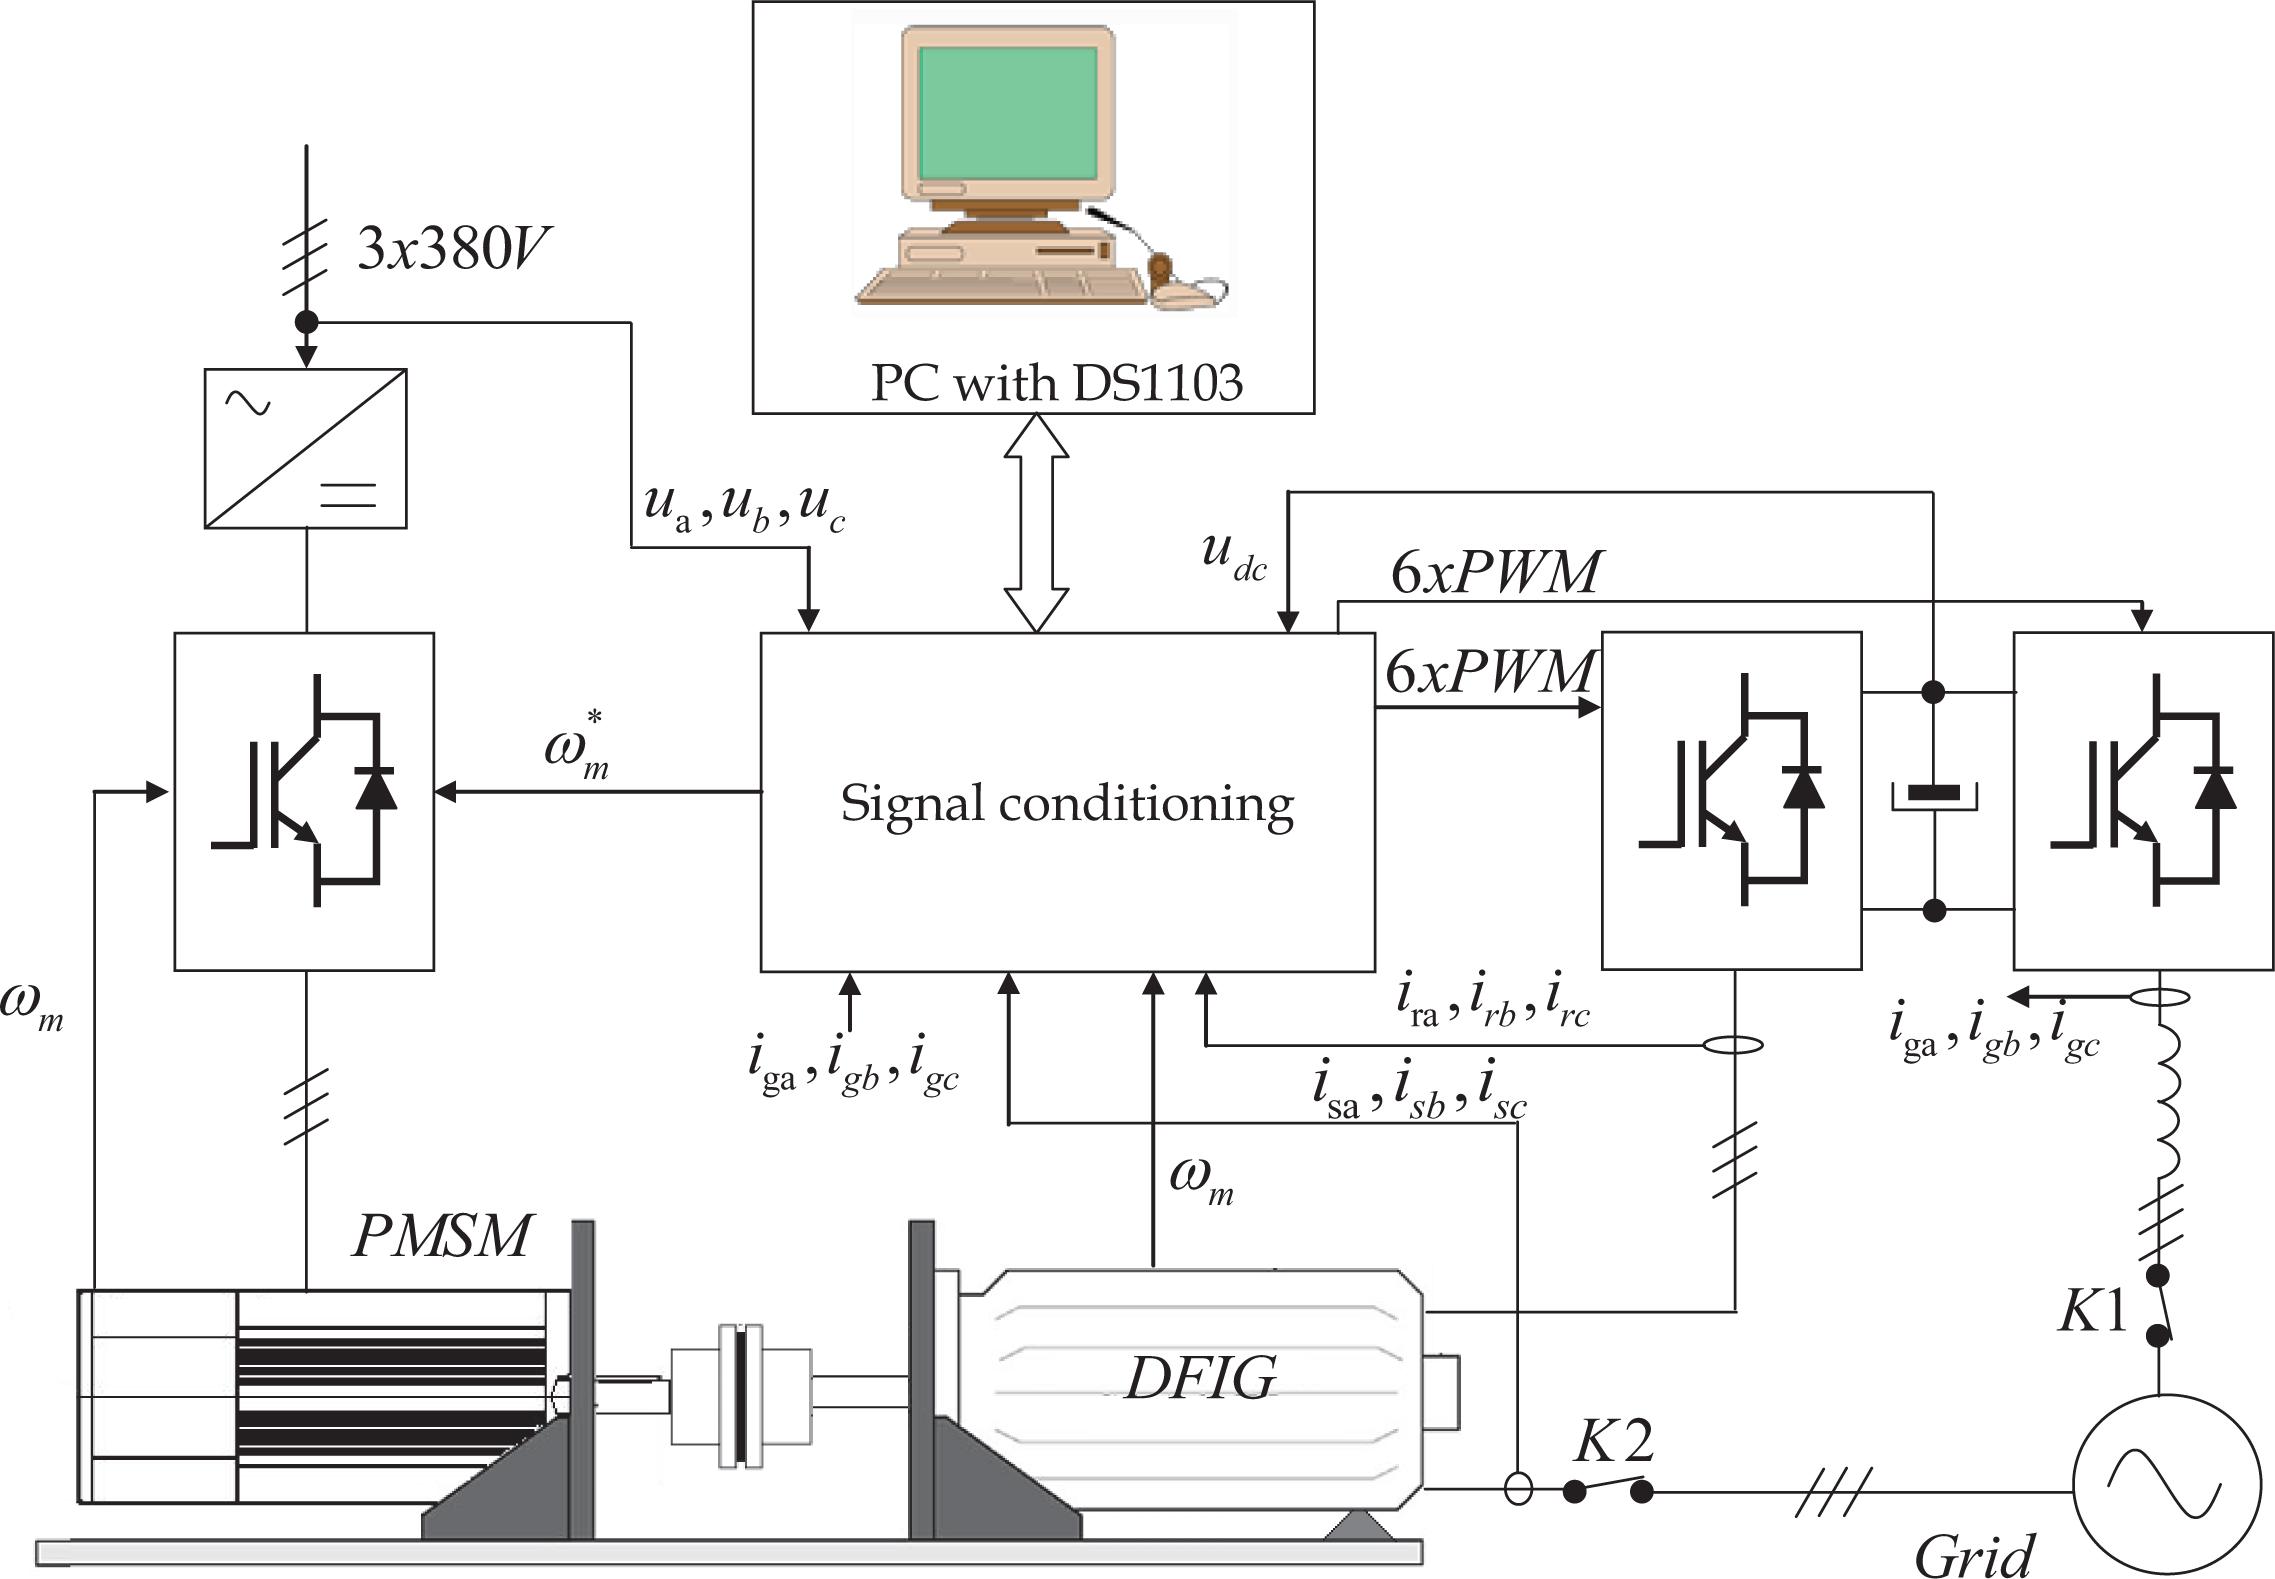 Bohn Walk In Freezer Wiring Diagram Modern Design Of Condenser Wire Heatcraft Cooler Diagrams Viking Remote Fezeere